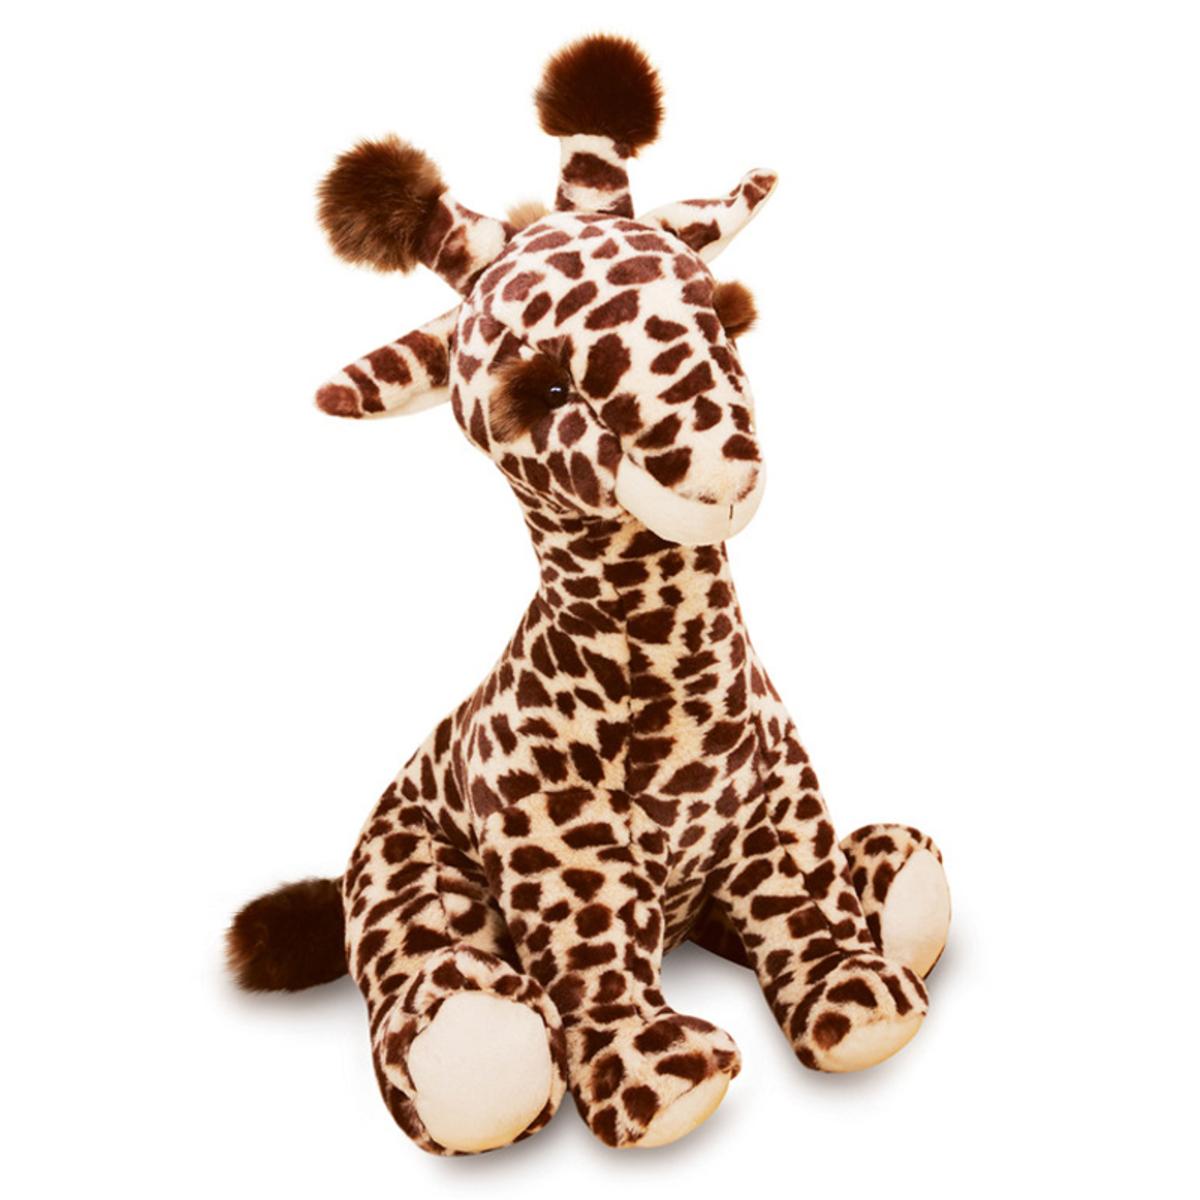 Peluche Lisi la Girafe Naturelle - Terre sauvage Peluche Girafe 50 cm